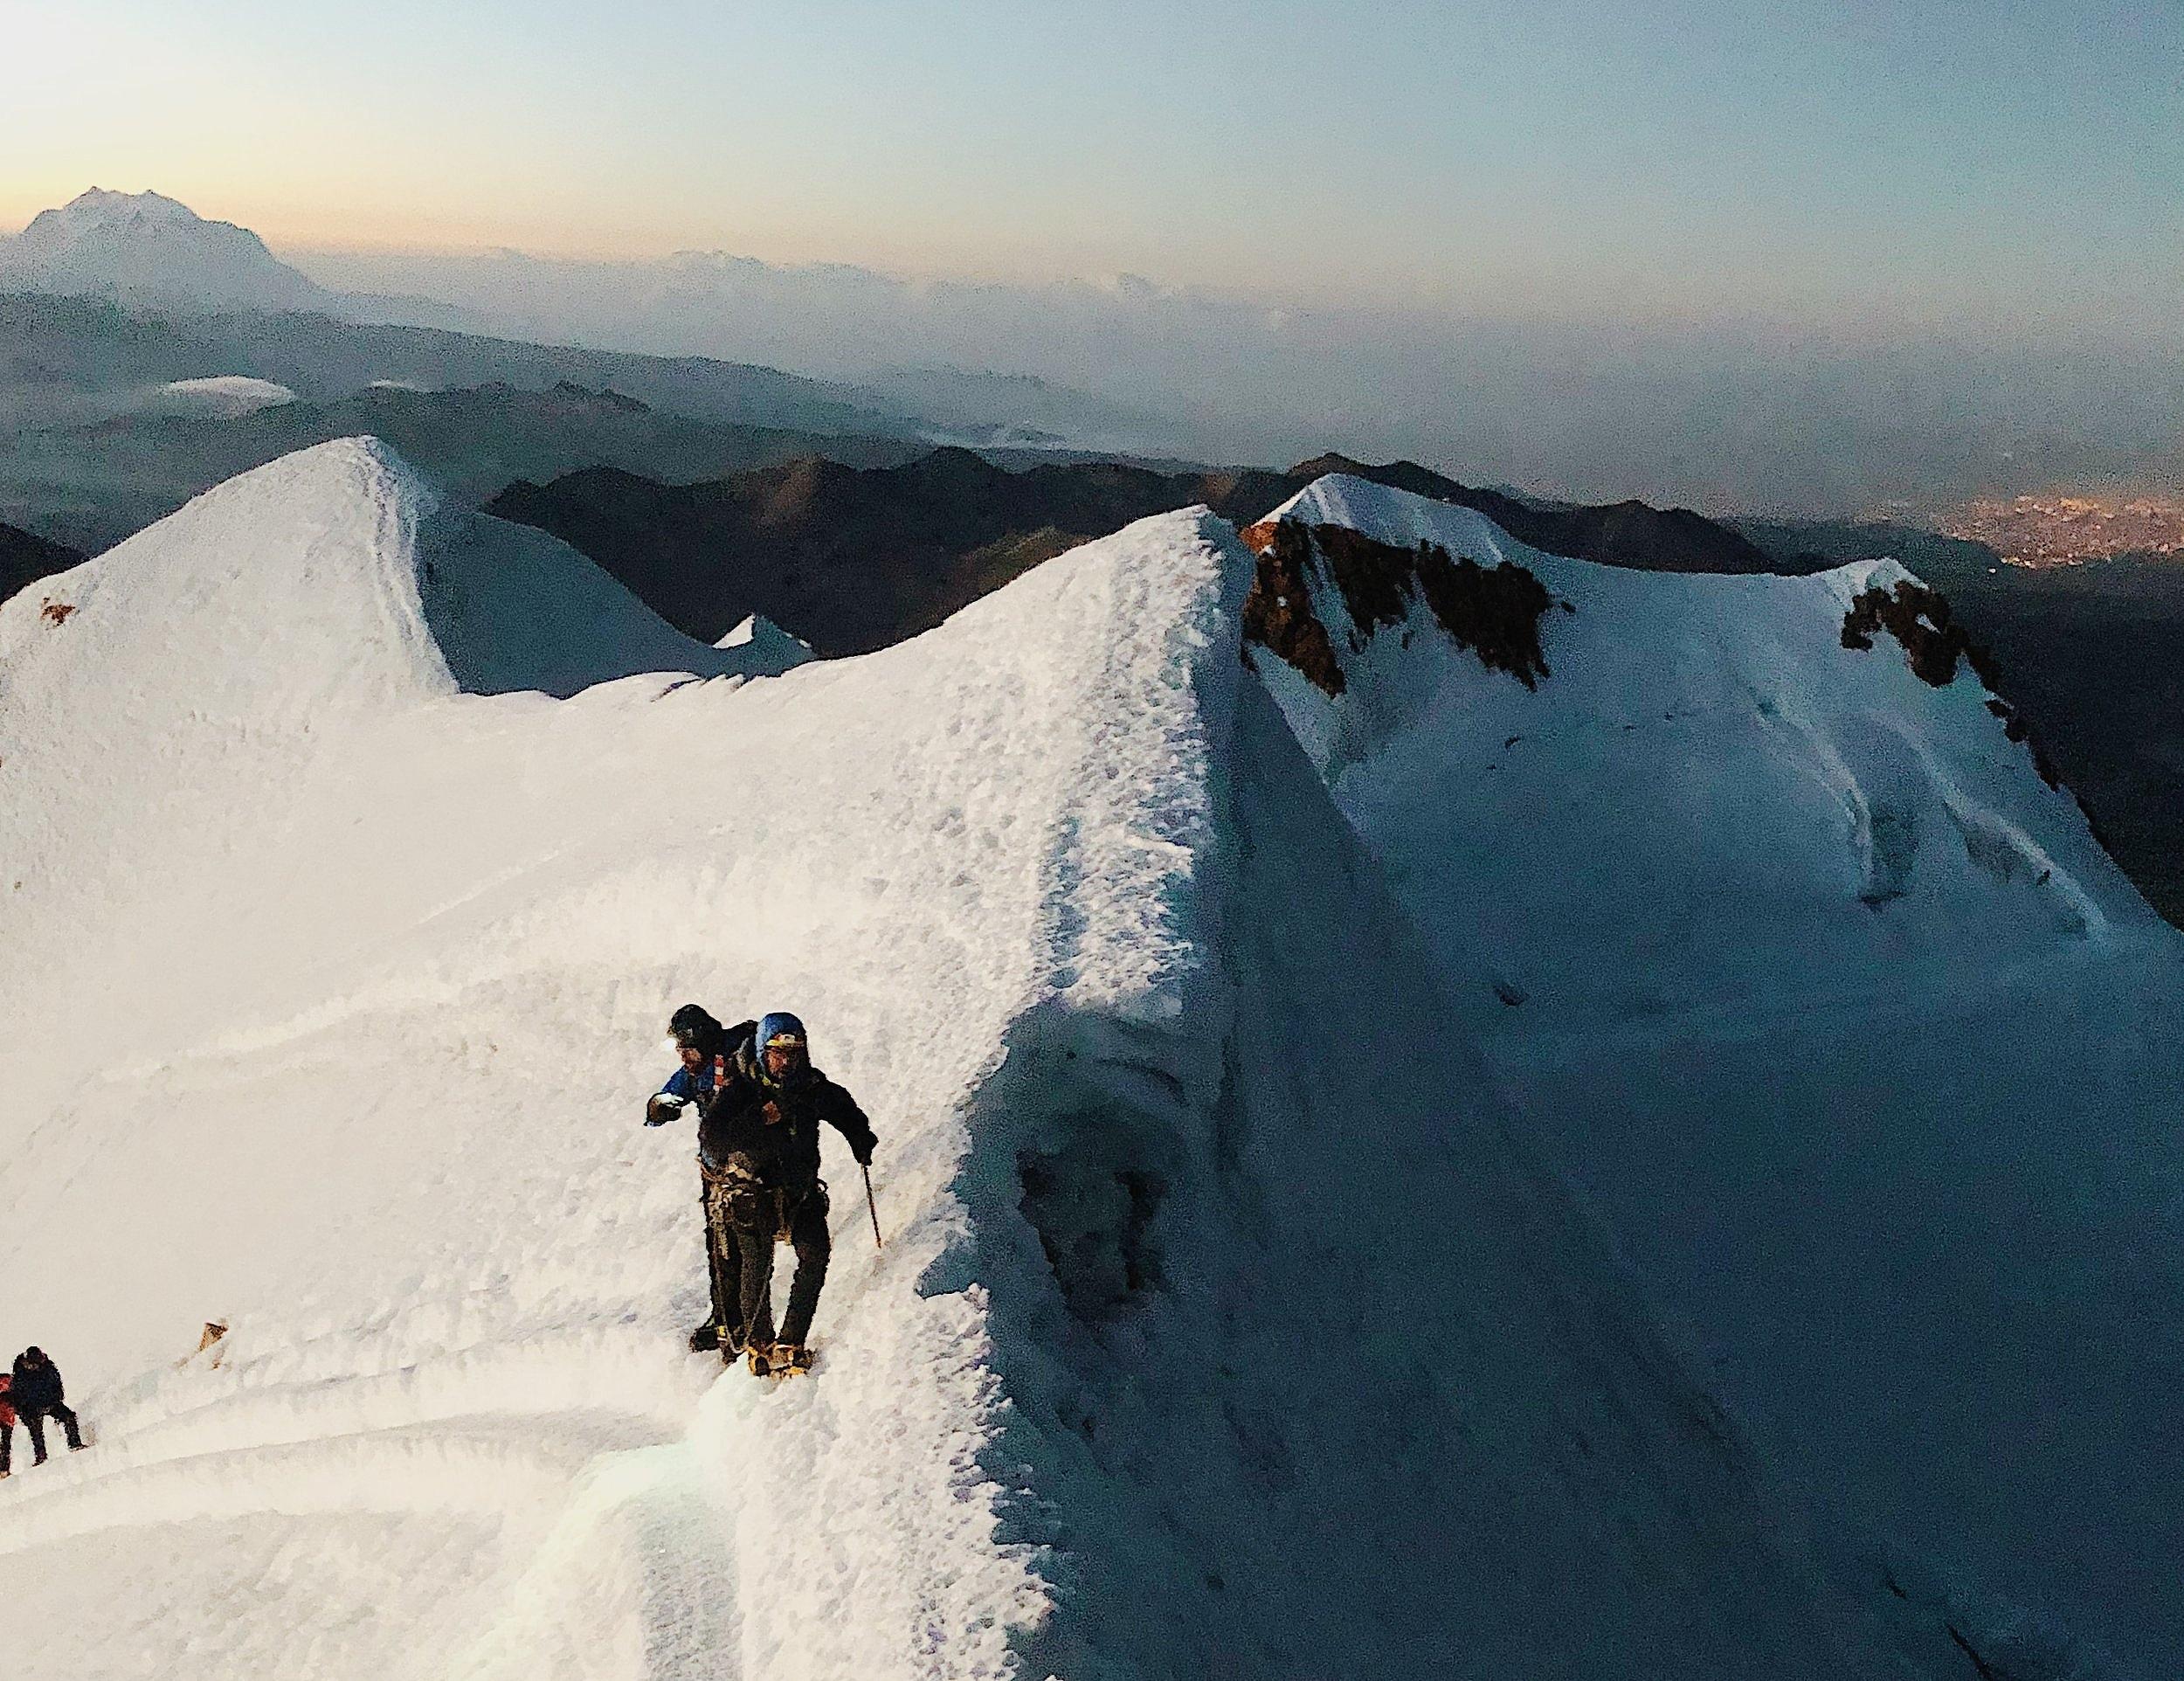 Nearing Huayna Potosi summit